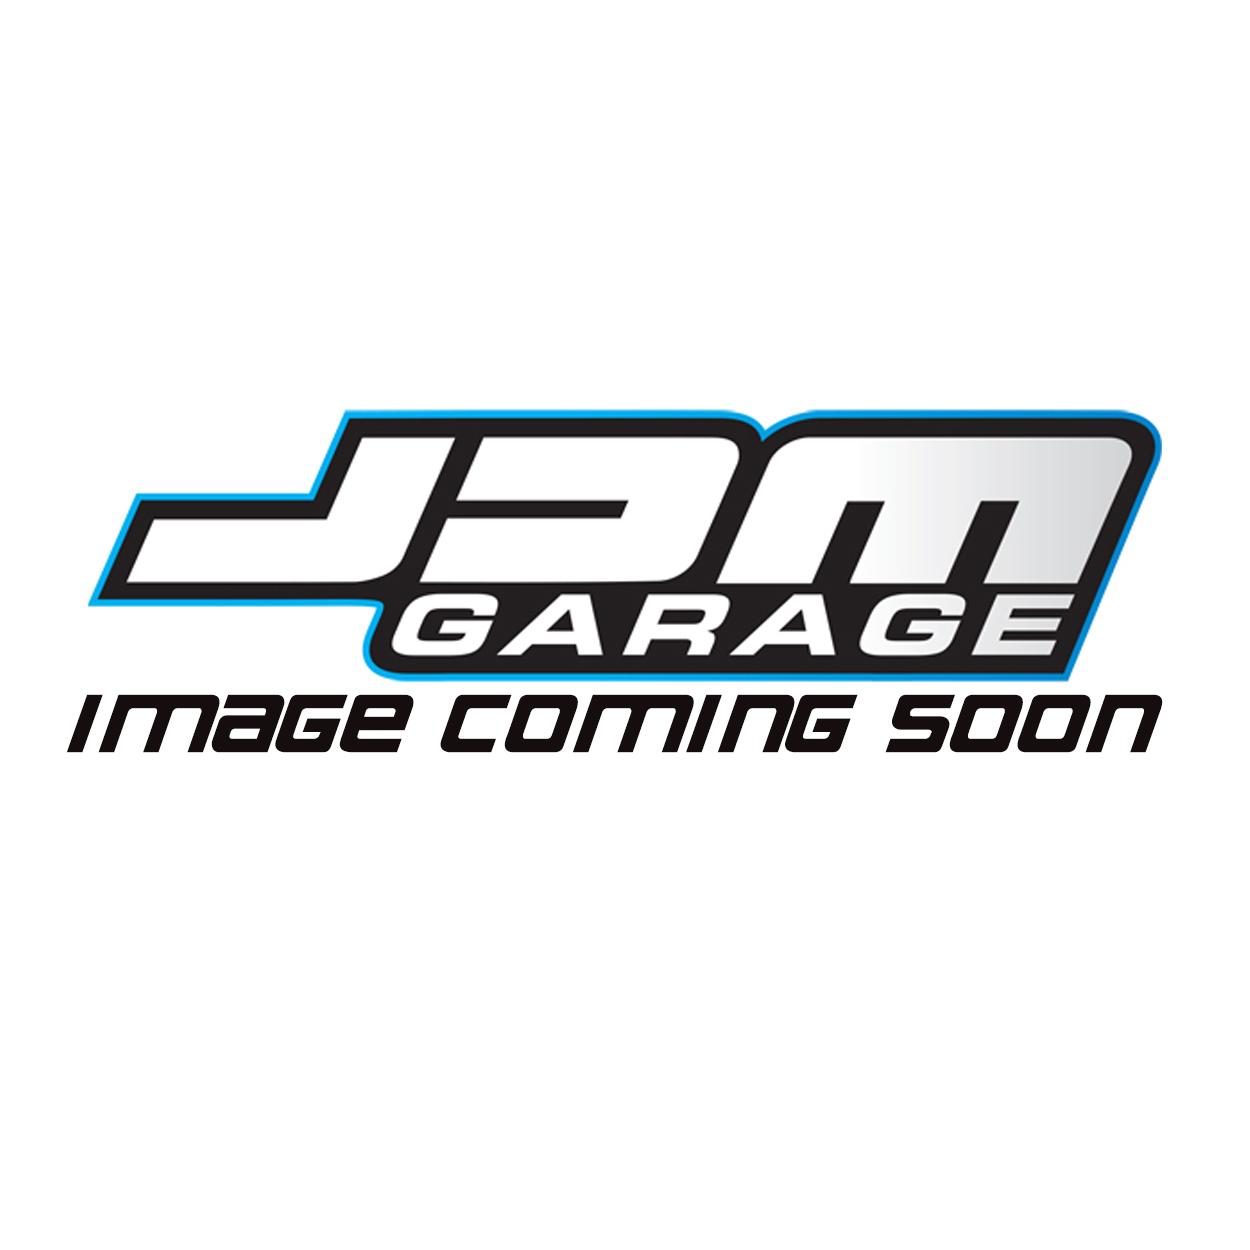 Xtreme Clutch & Flywheel - Organic / Ceramic / Carbon / Single & Twin Plate - Mitsubishi Lancer EVO 4 / 5 / 6 / 7 / 8 / 9